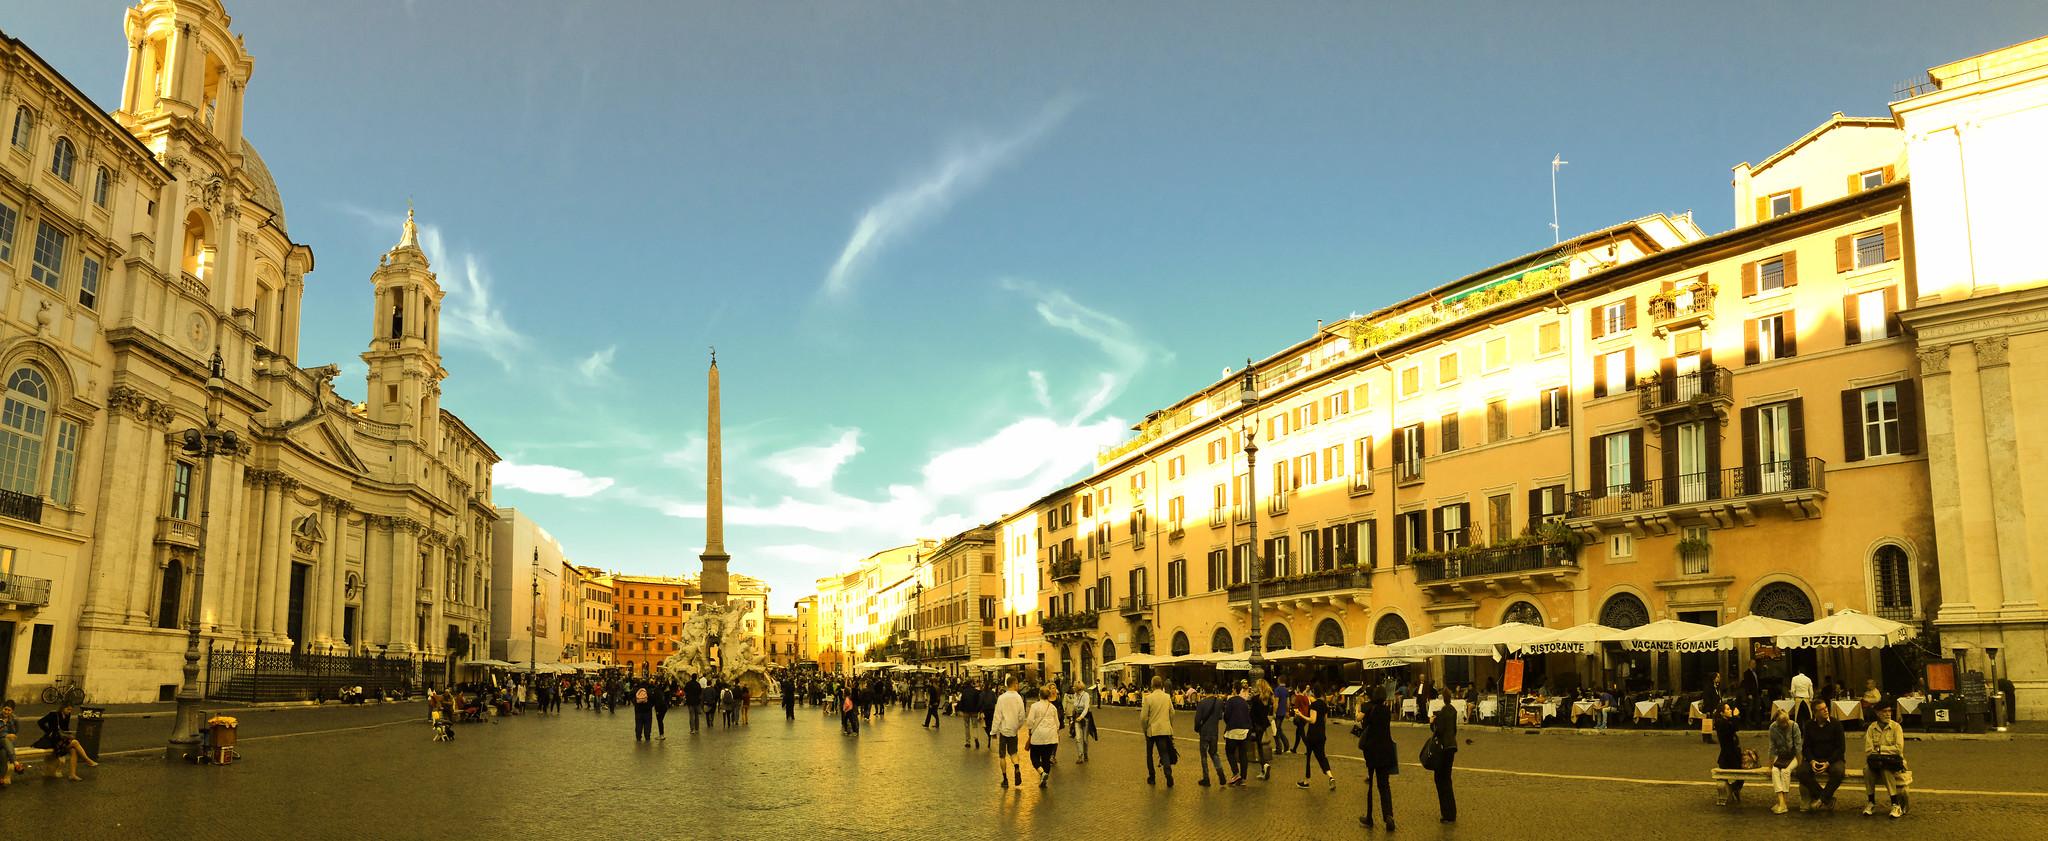 Piazza Navona , central Rome's elegant showcase square.